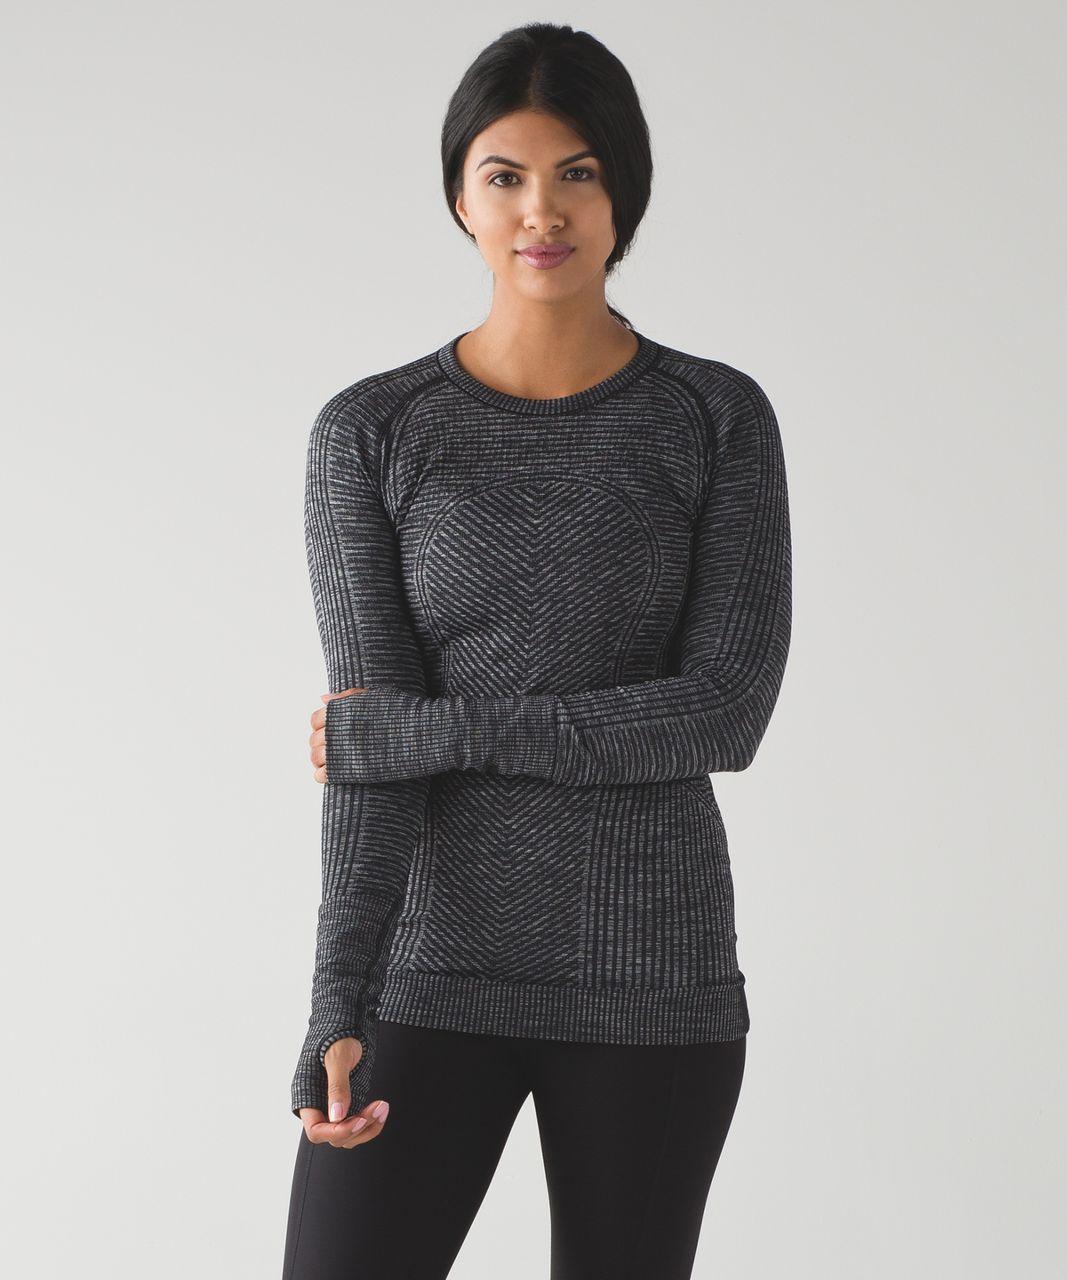 Lululemon Restless Pullover - Heathered Black